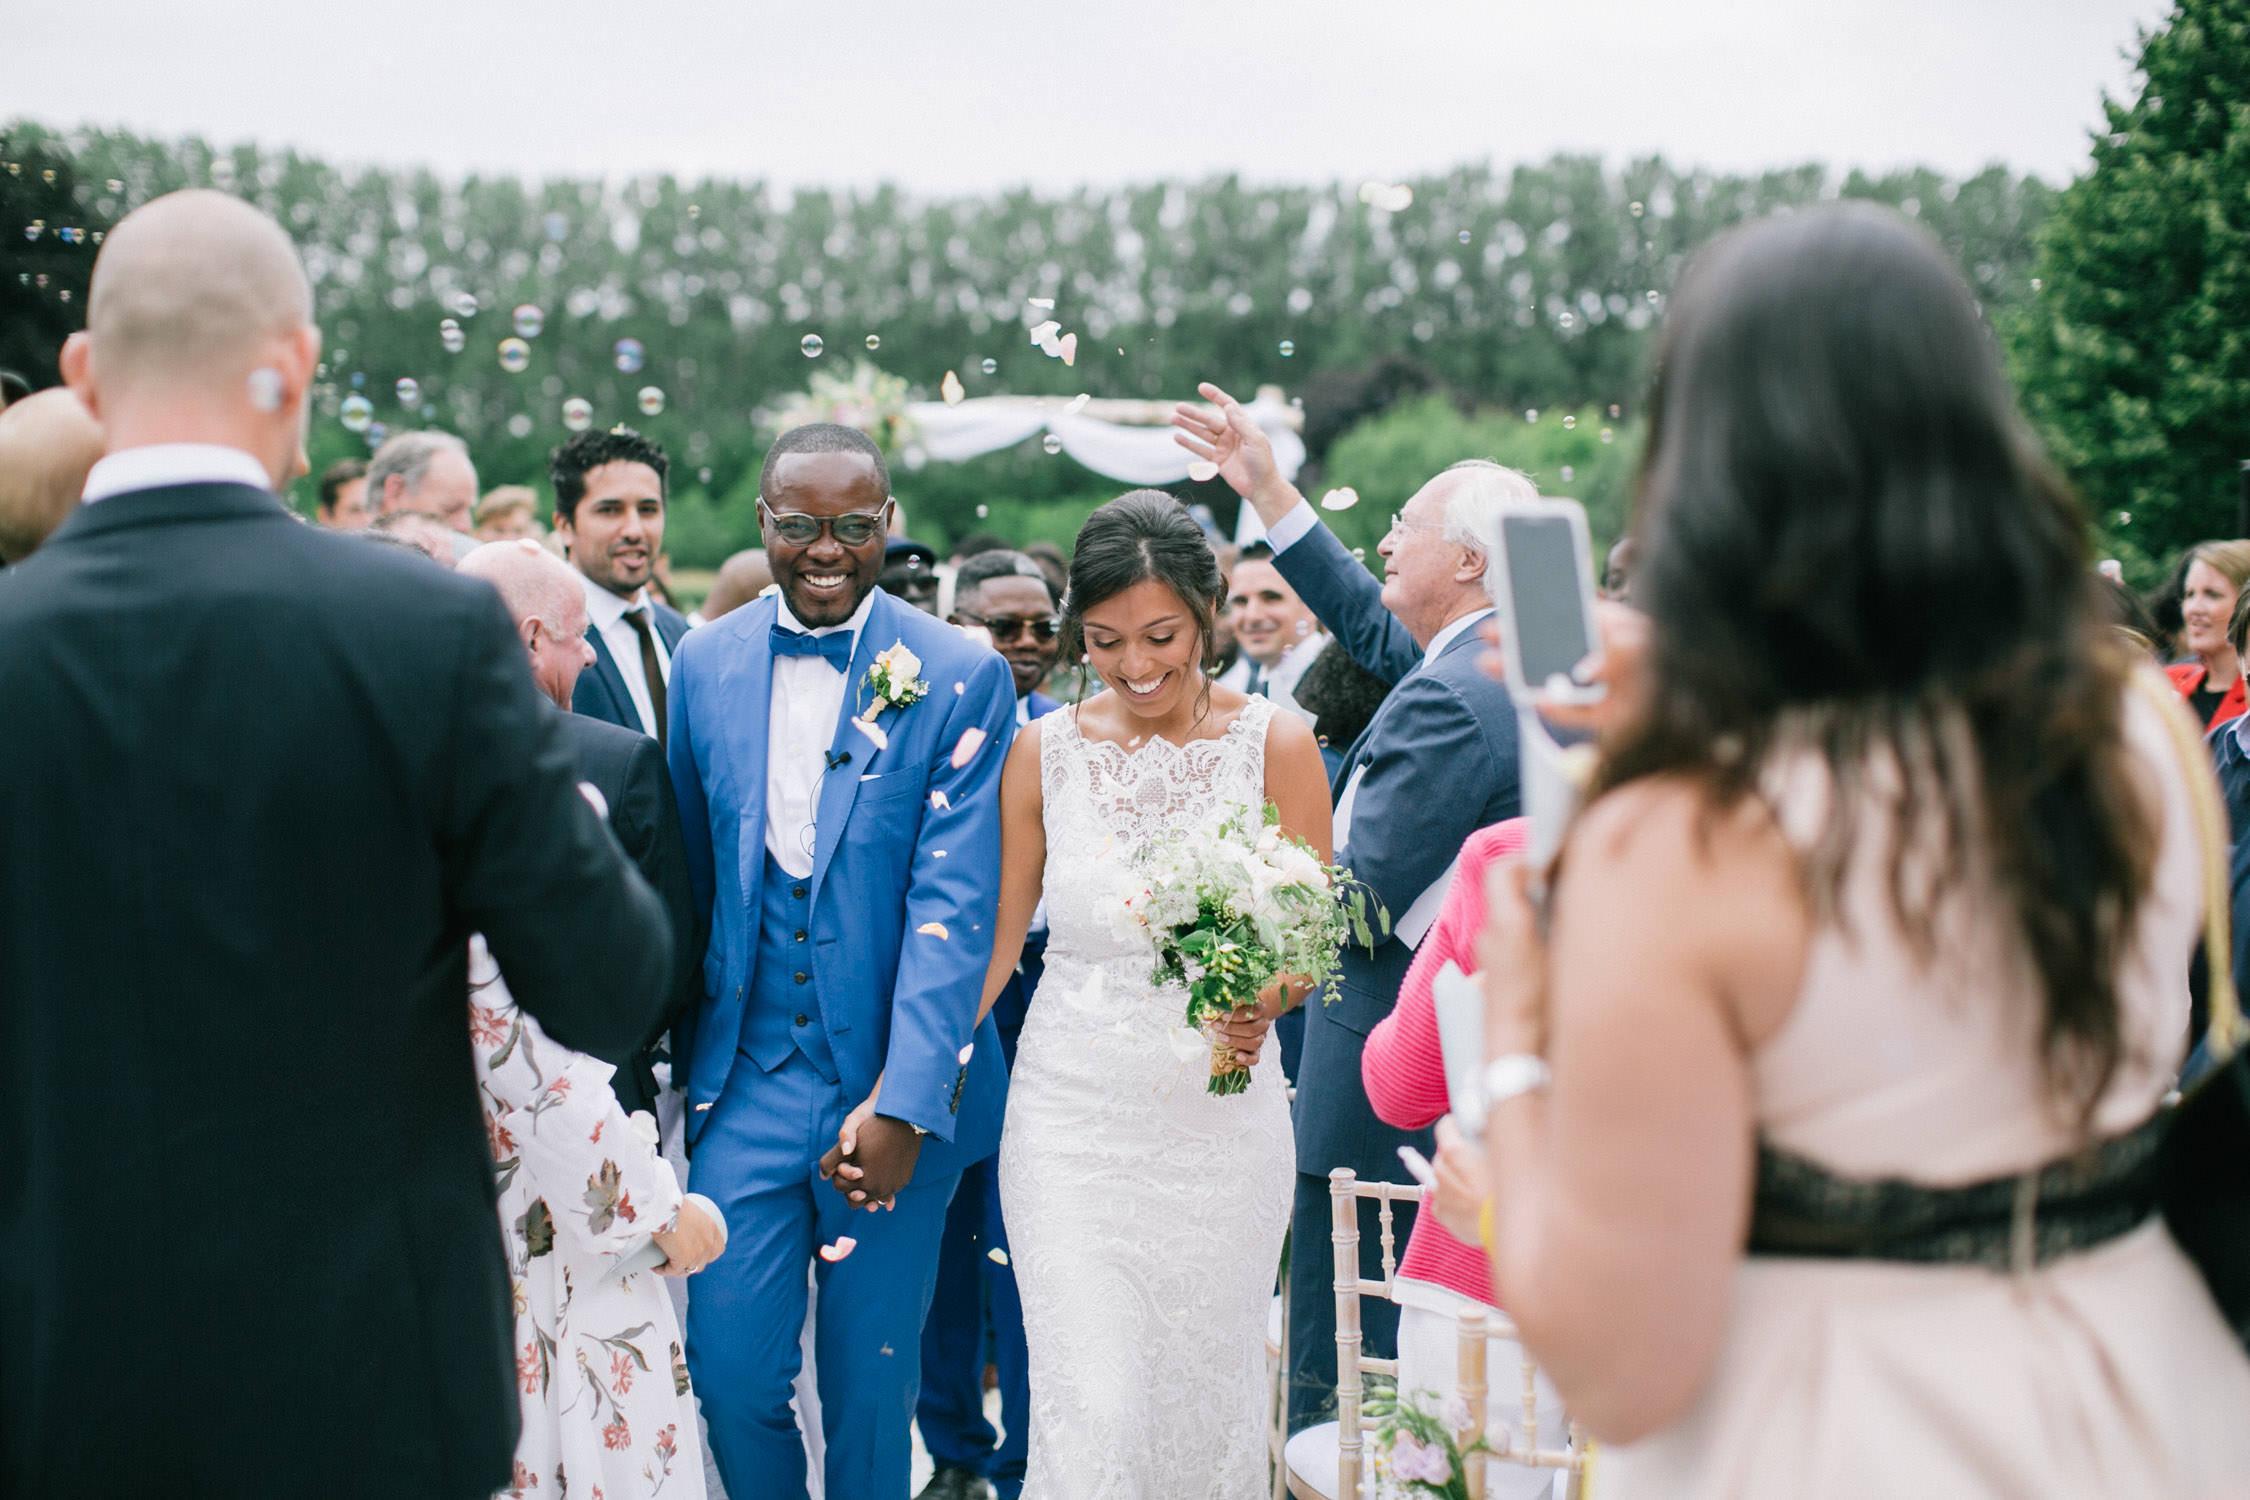 Huwelijksfotograaf La Ferme de Balingue, Silly